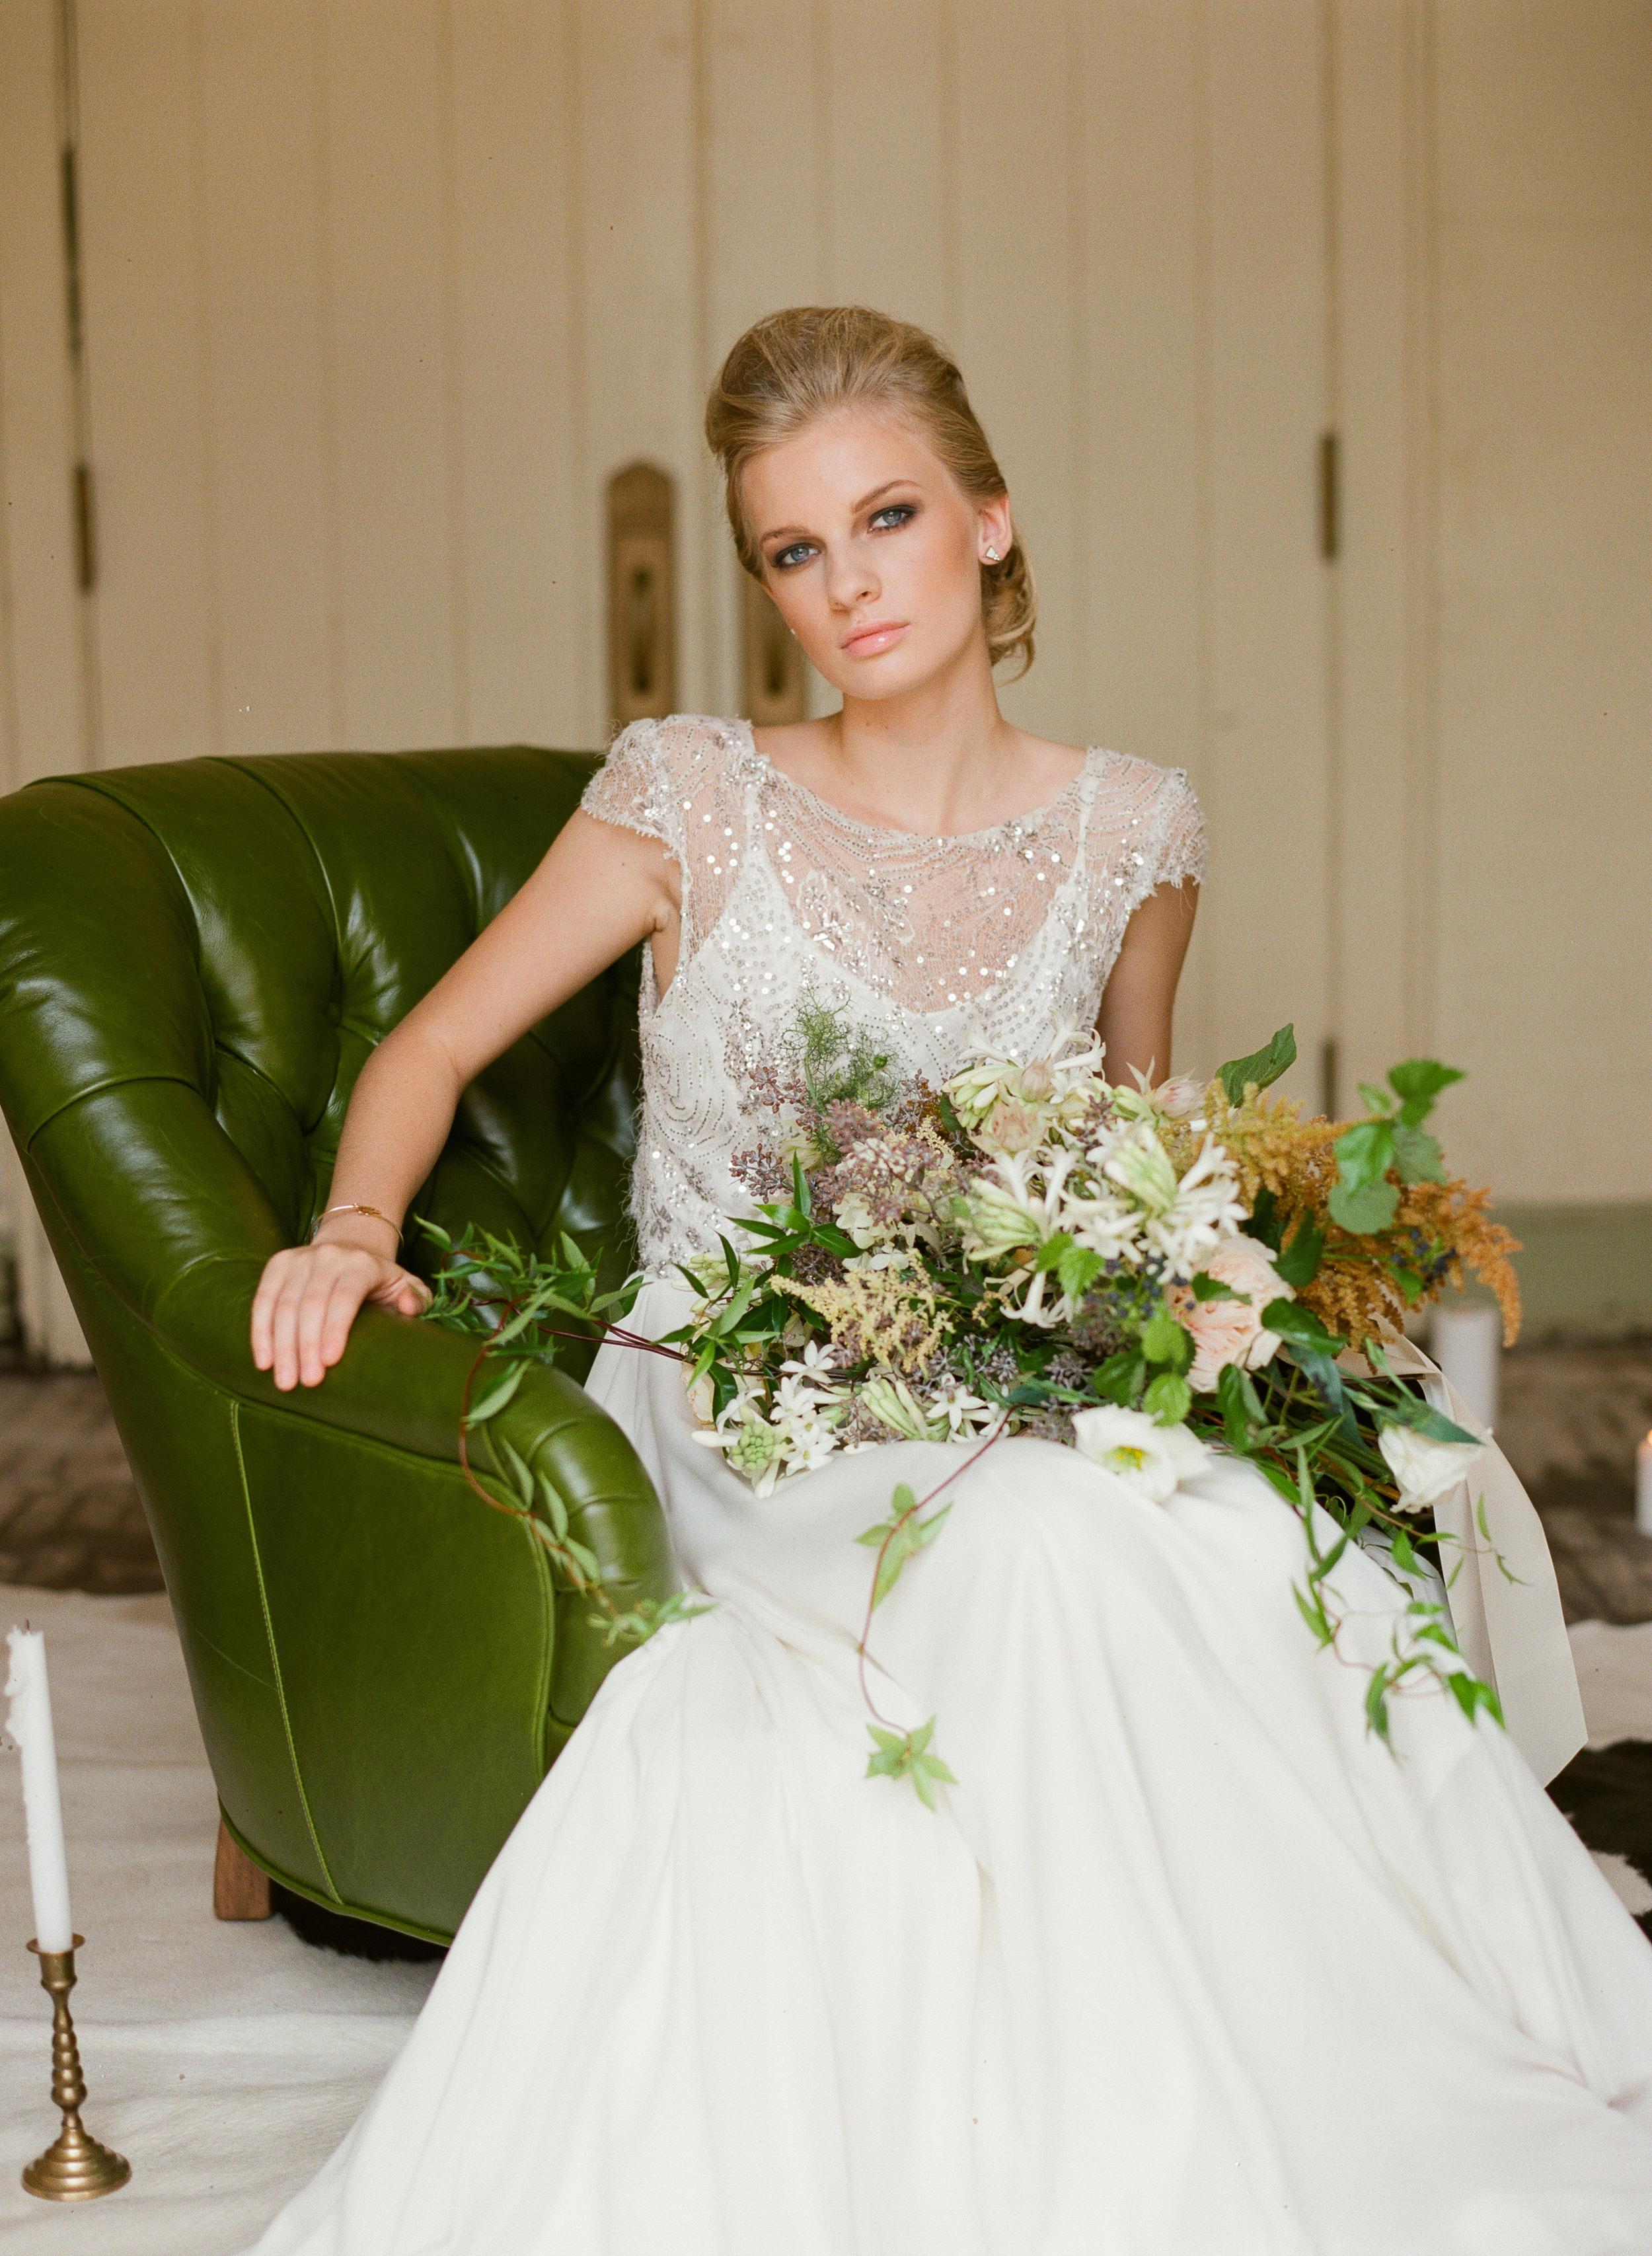 Olivia-Griffin-trendy-bride-magazine-willow-florals-sarah-seven-gwen-ivory-and-beau-bridal-boutique-savannah-wedding-dresses-savannah-bridal-boutique-savannah-wedding-savannah-bridal-gowns-savannah-wedding-planner-georgia-bridal-boutique-3.JPG